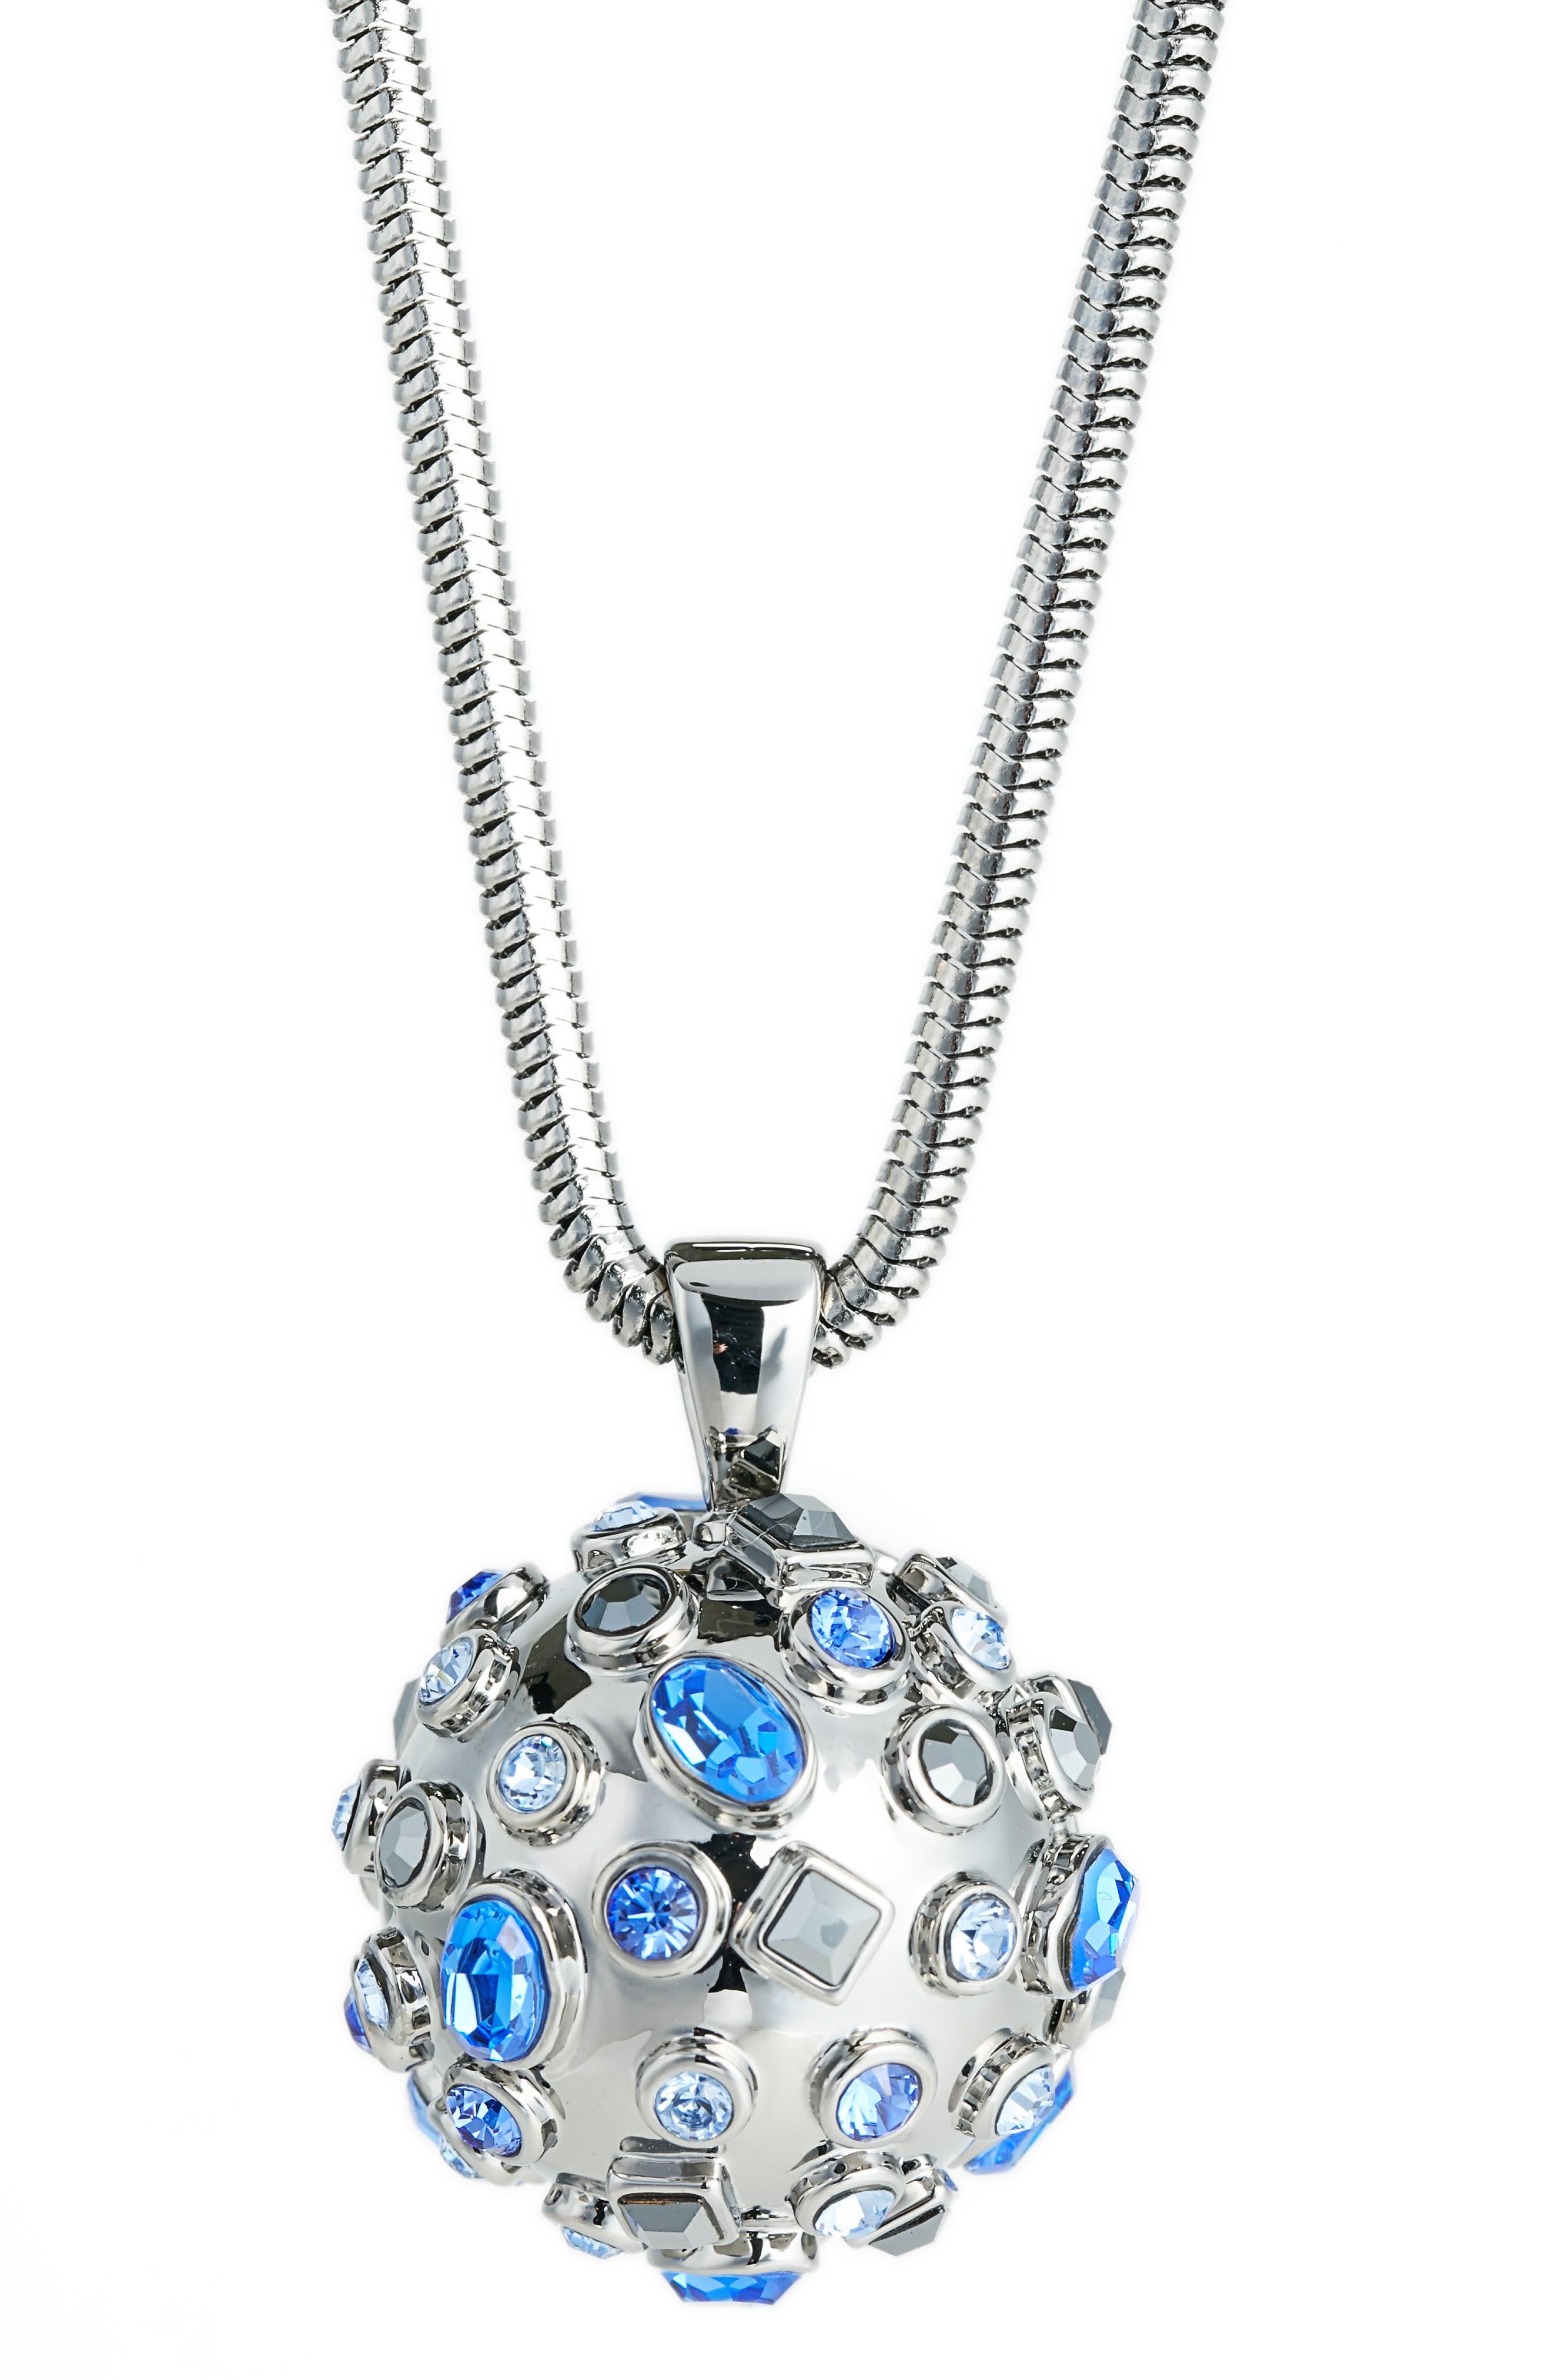 Main Image - St. John Collection Swarovski Crystal Pendant Necklace